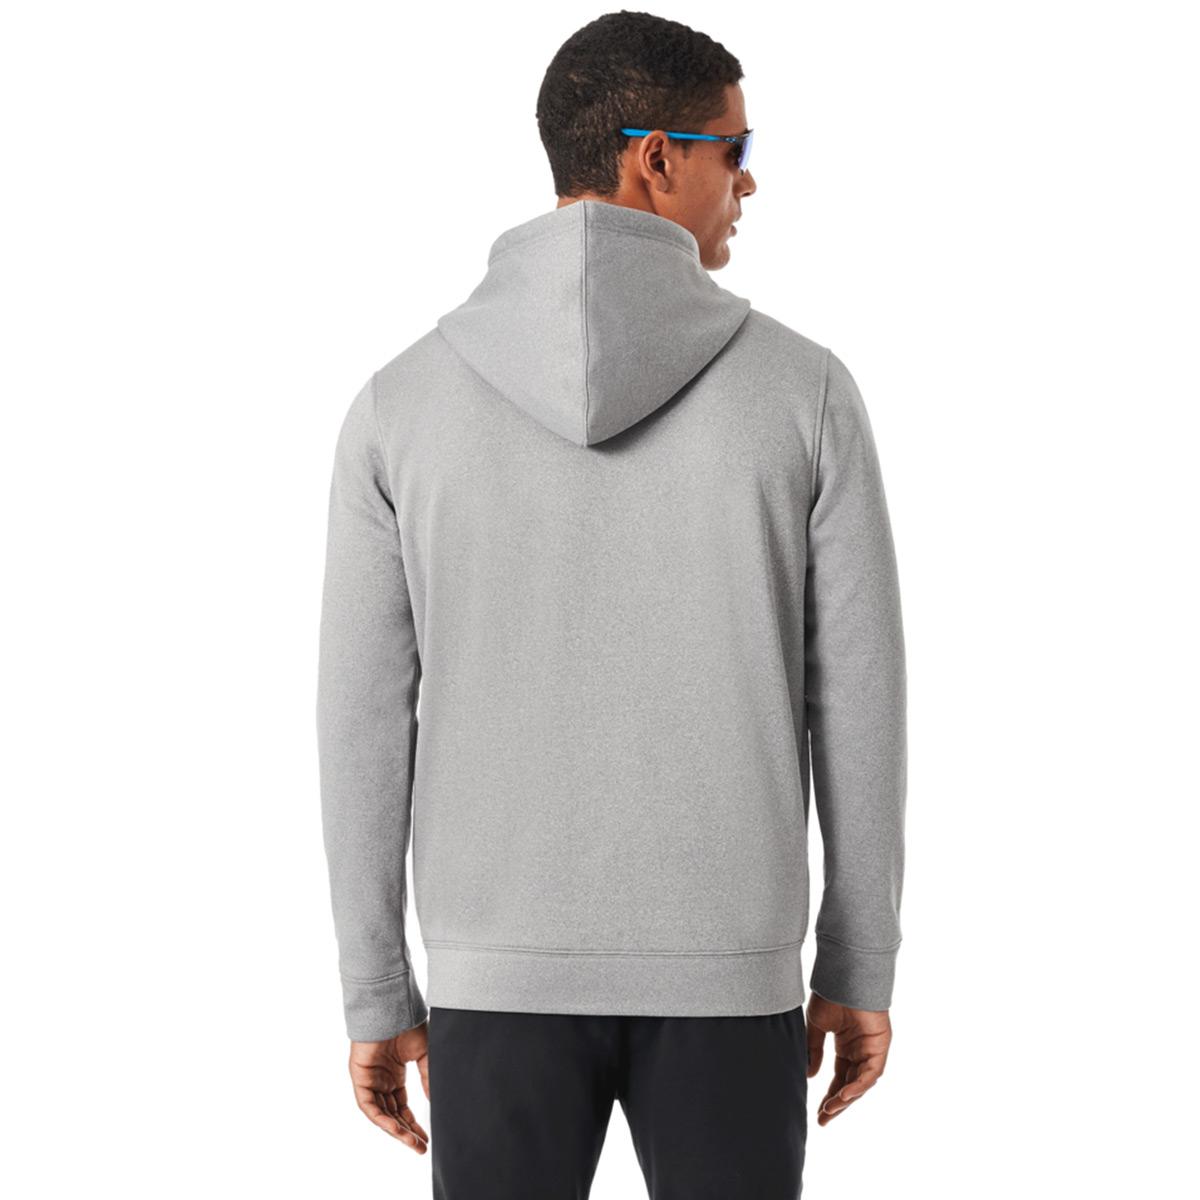 Oakley-Sport-Mens-2018-360-Full-Zip-Performance-Regular-Fit-Fleece-Hoodie